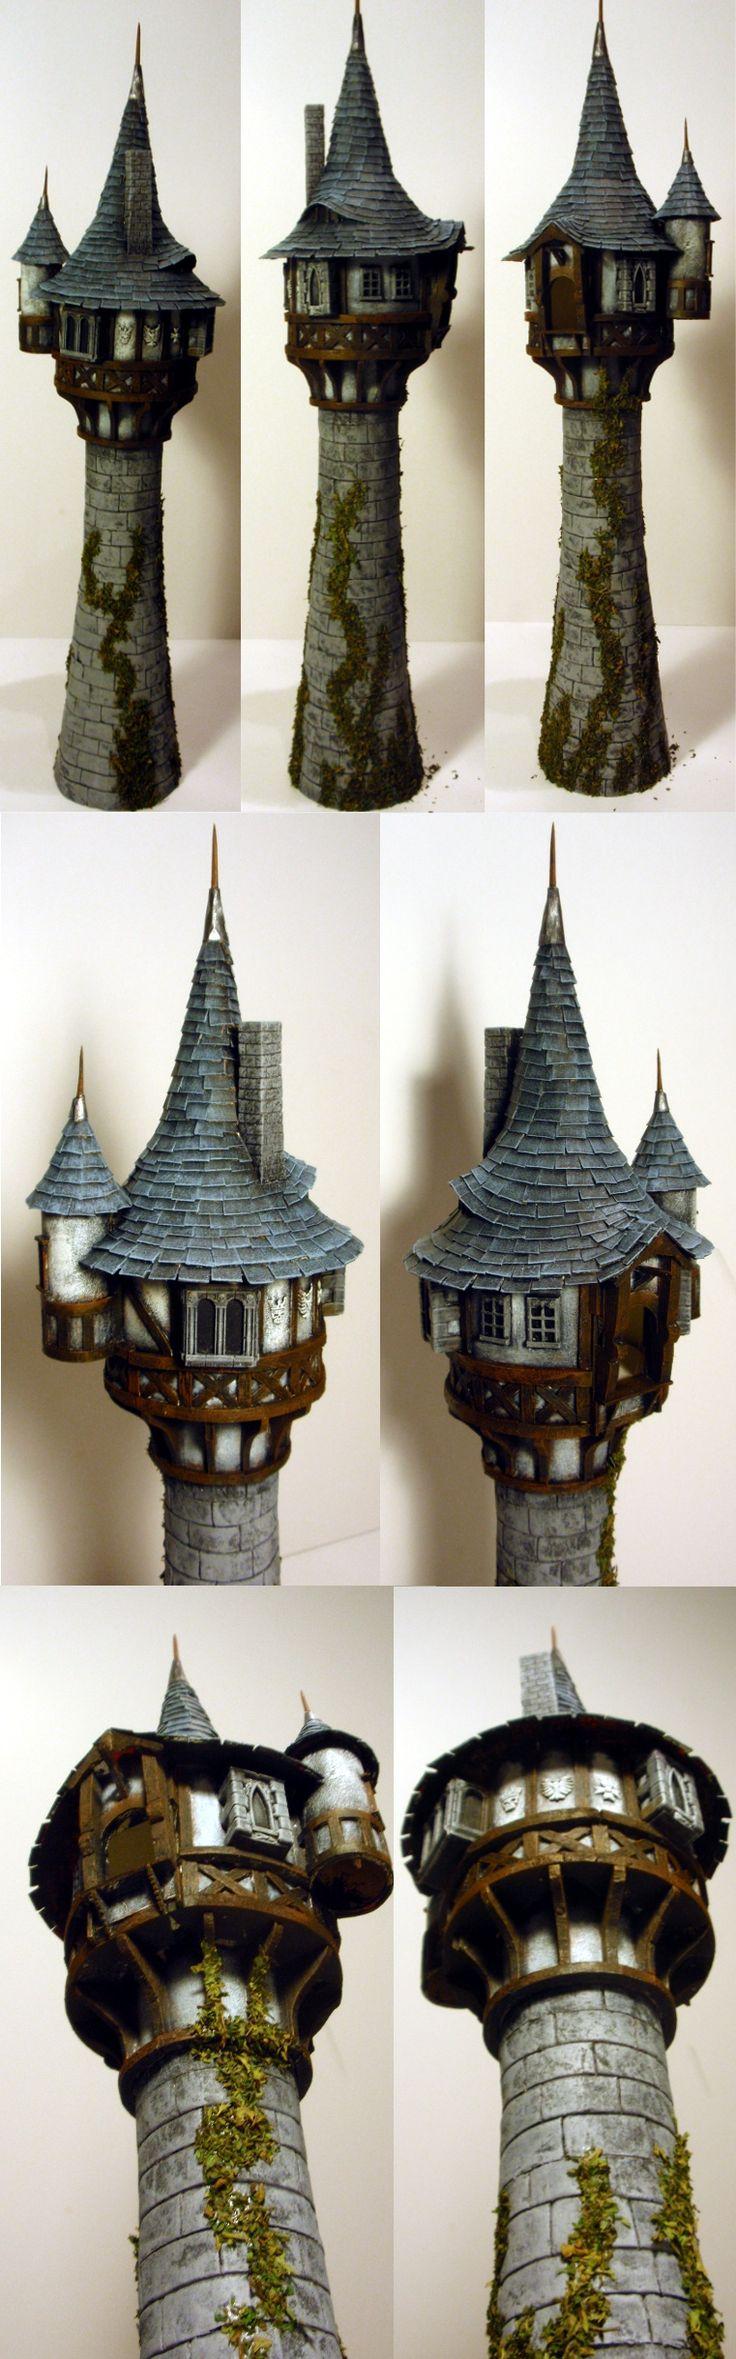 Tangled Tower by shadowwolf. I love the eyebrow window on the roof!